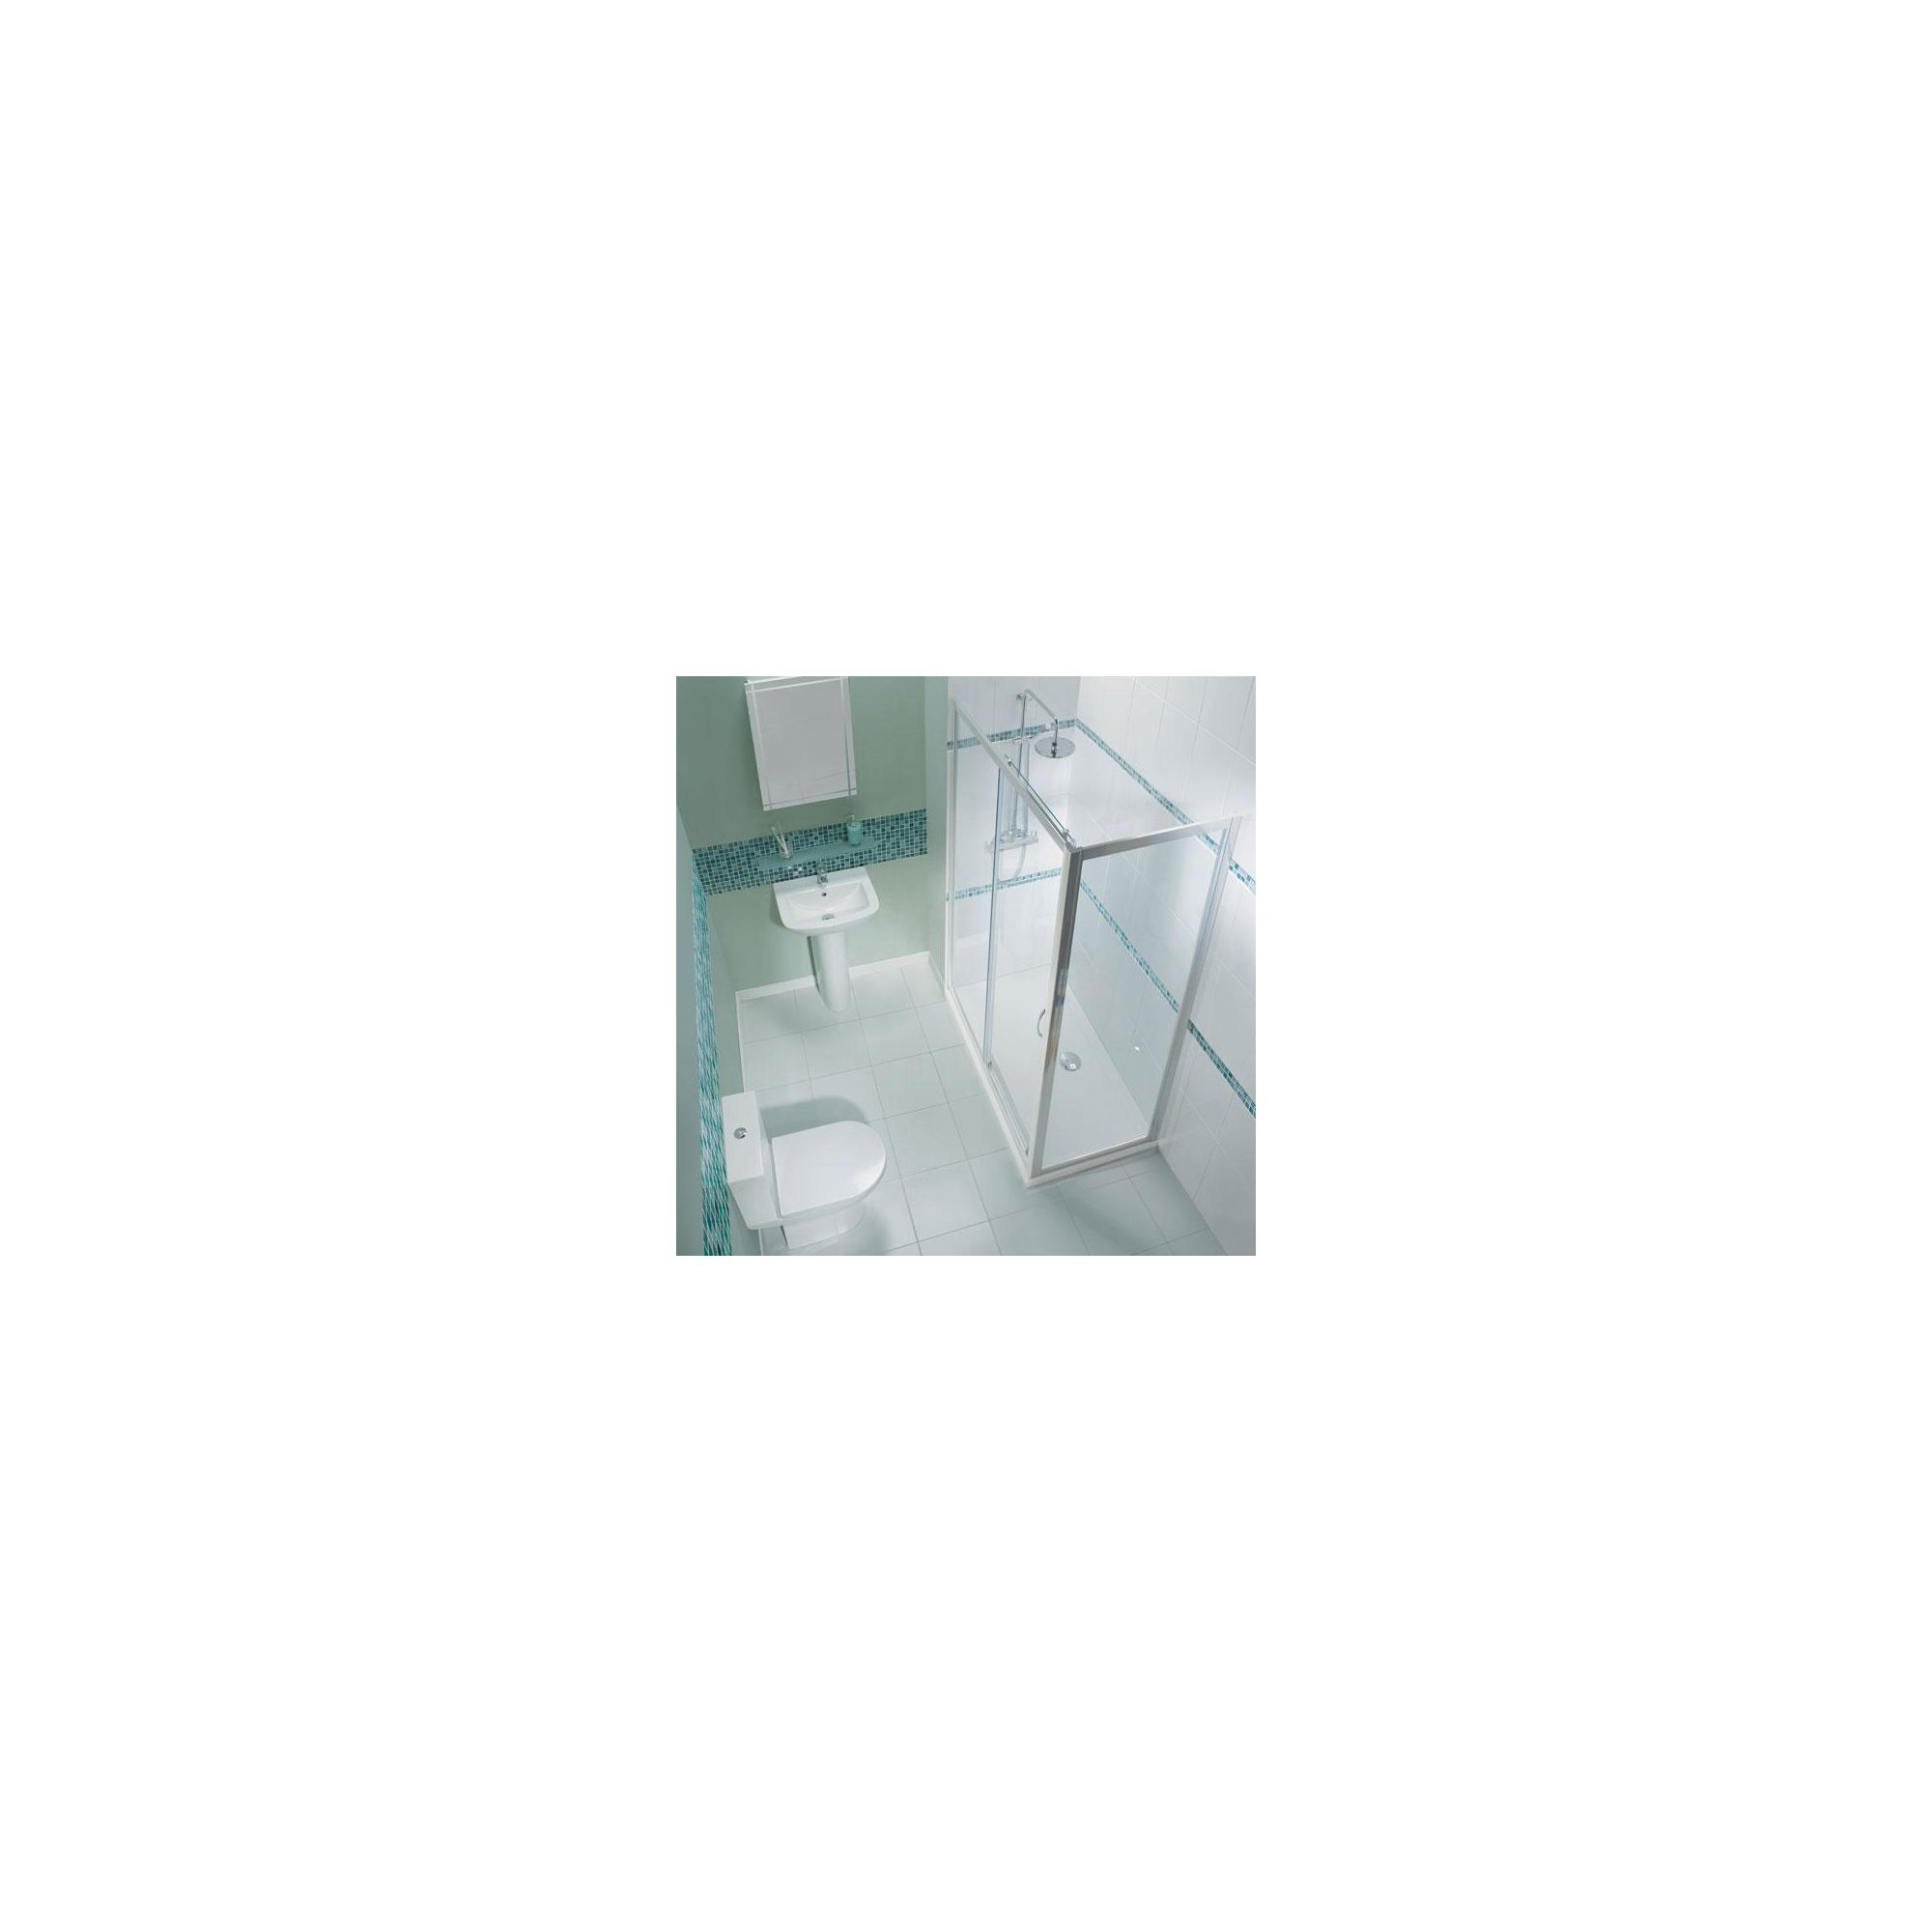 Balterley Framed Sliding Shower Door, 1600mm Wide, 6mm Glass at Tesco Direct